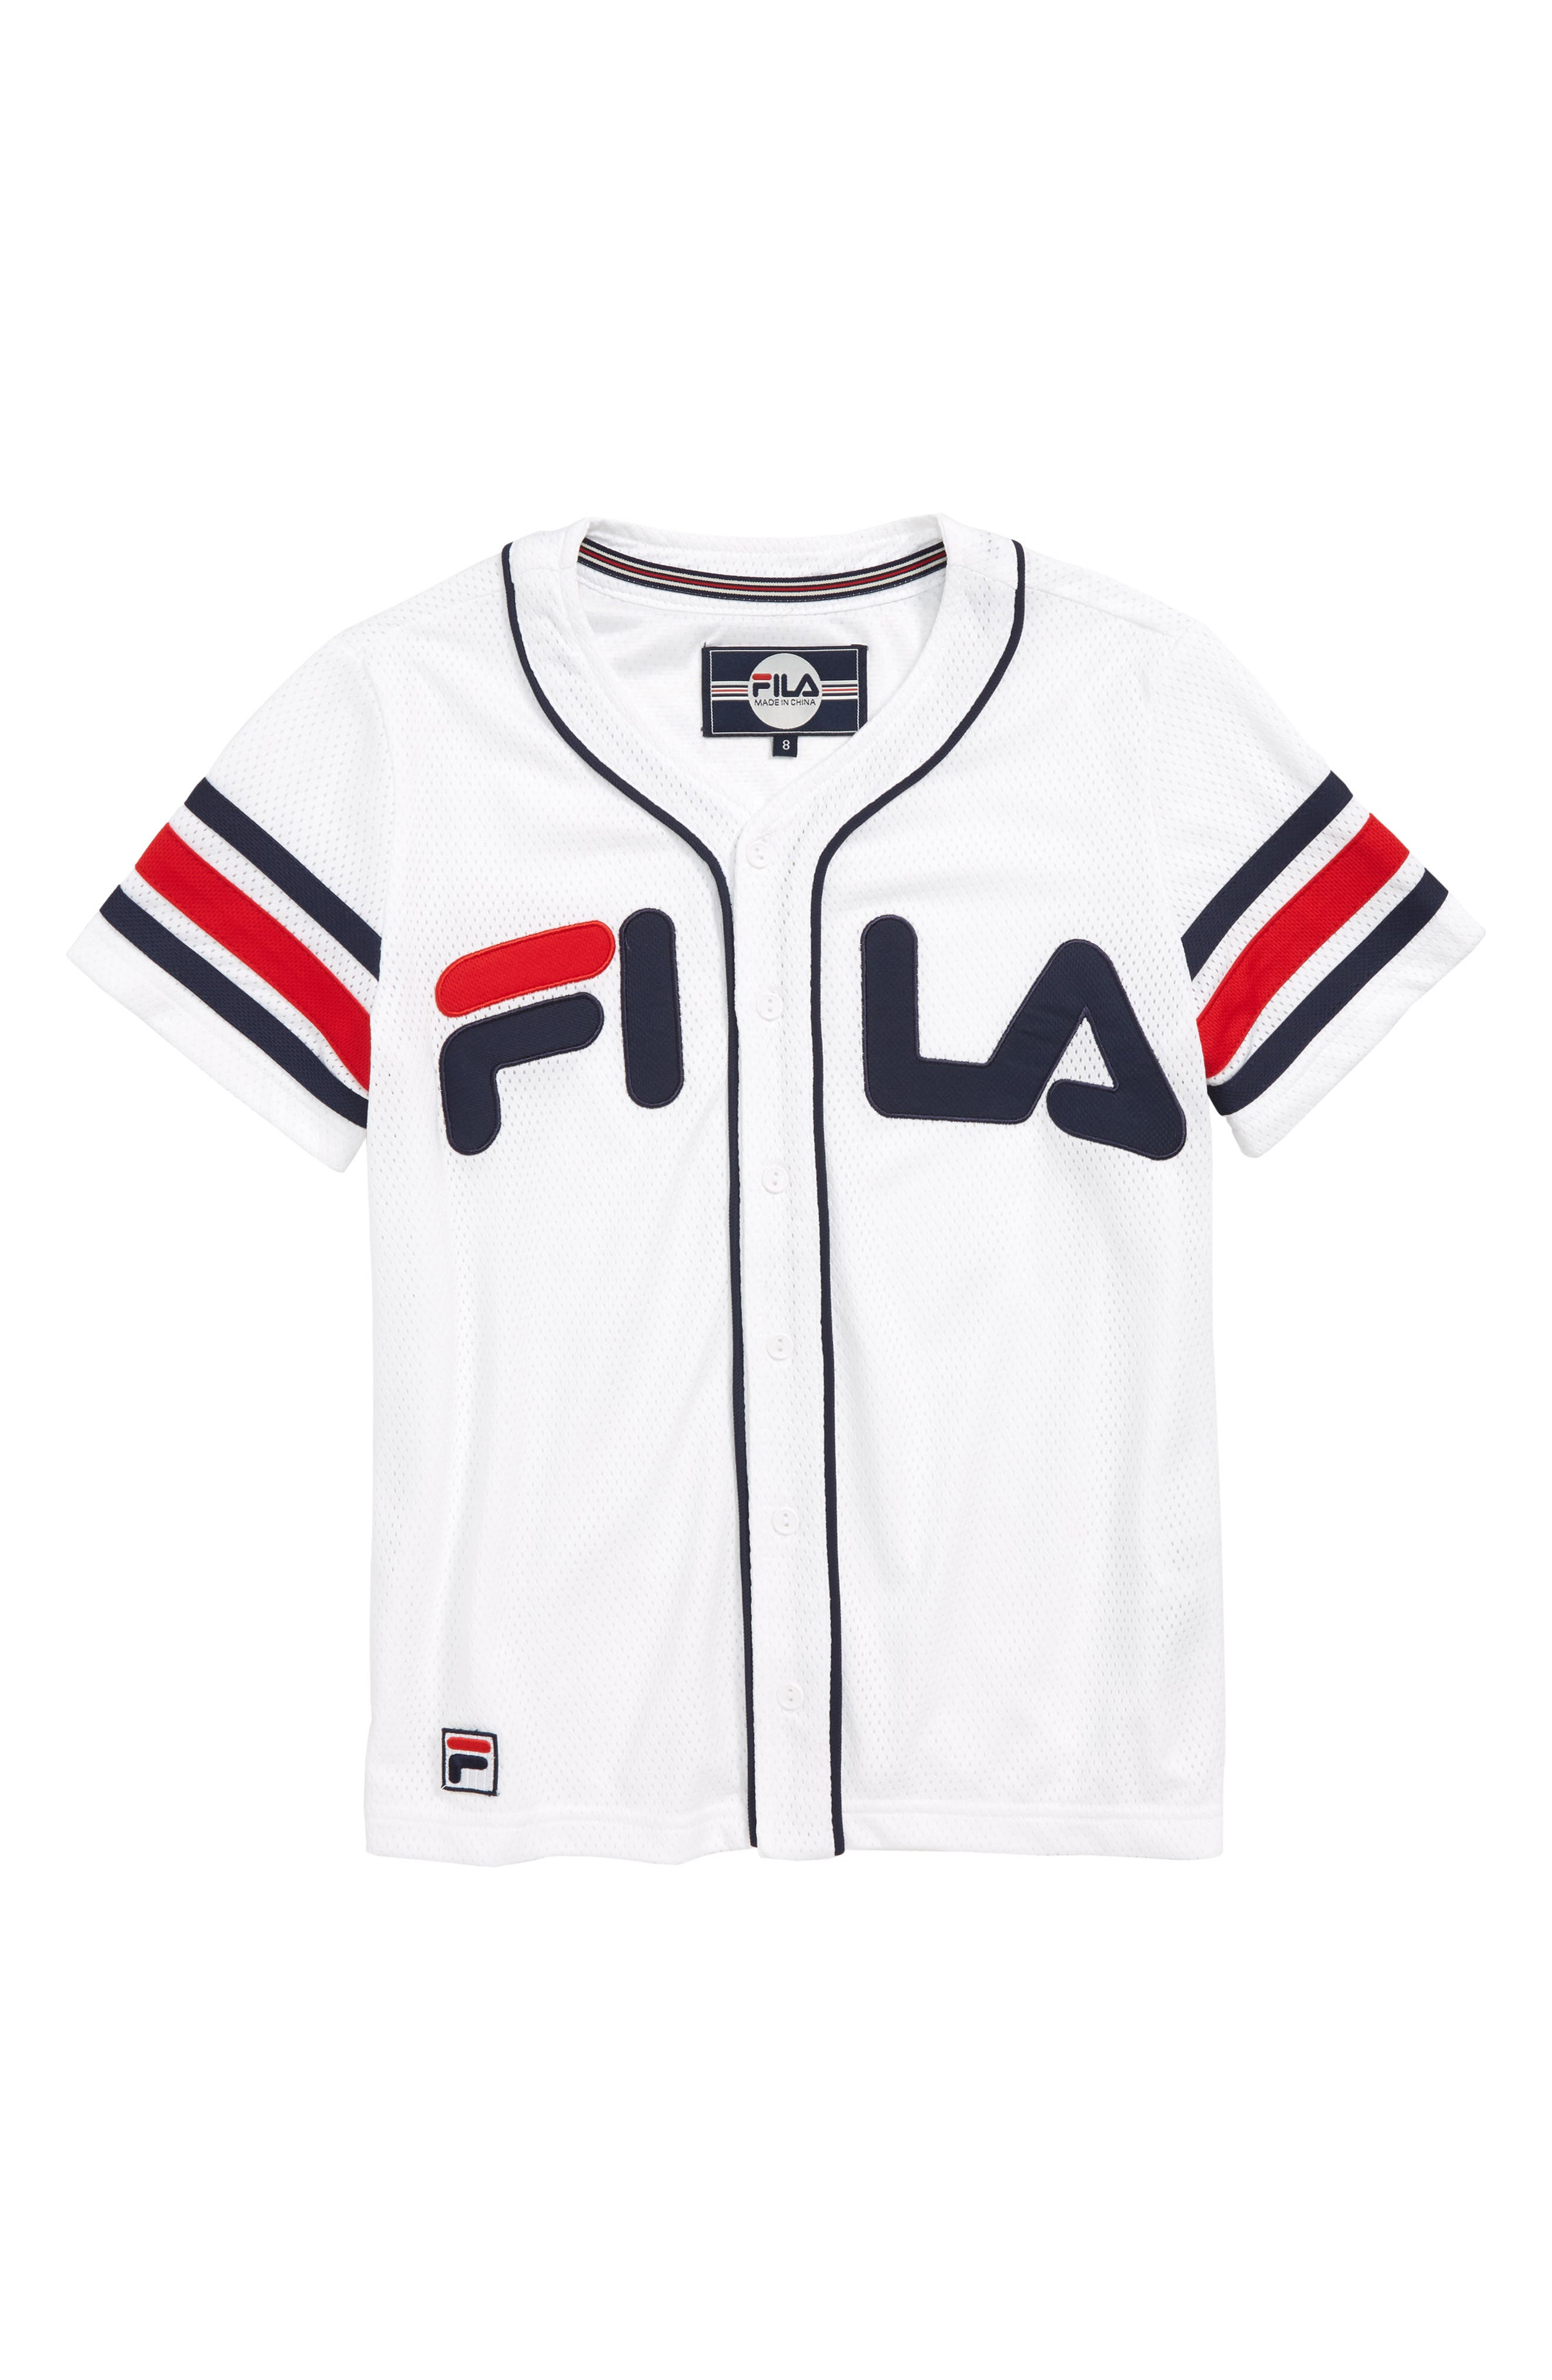 FILA Mesh Baseball Jersey, Main, color, 100